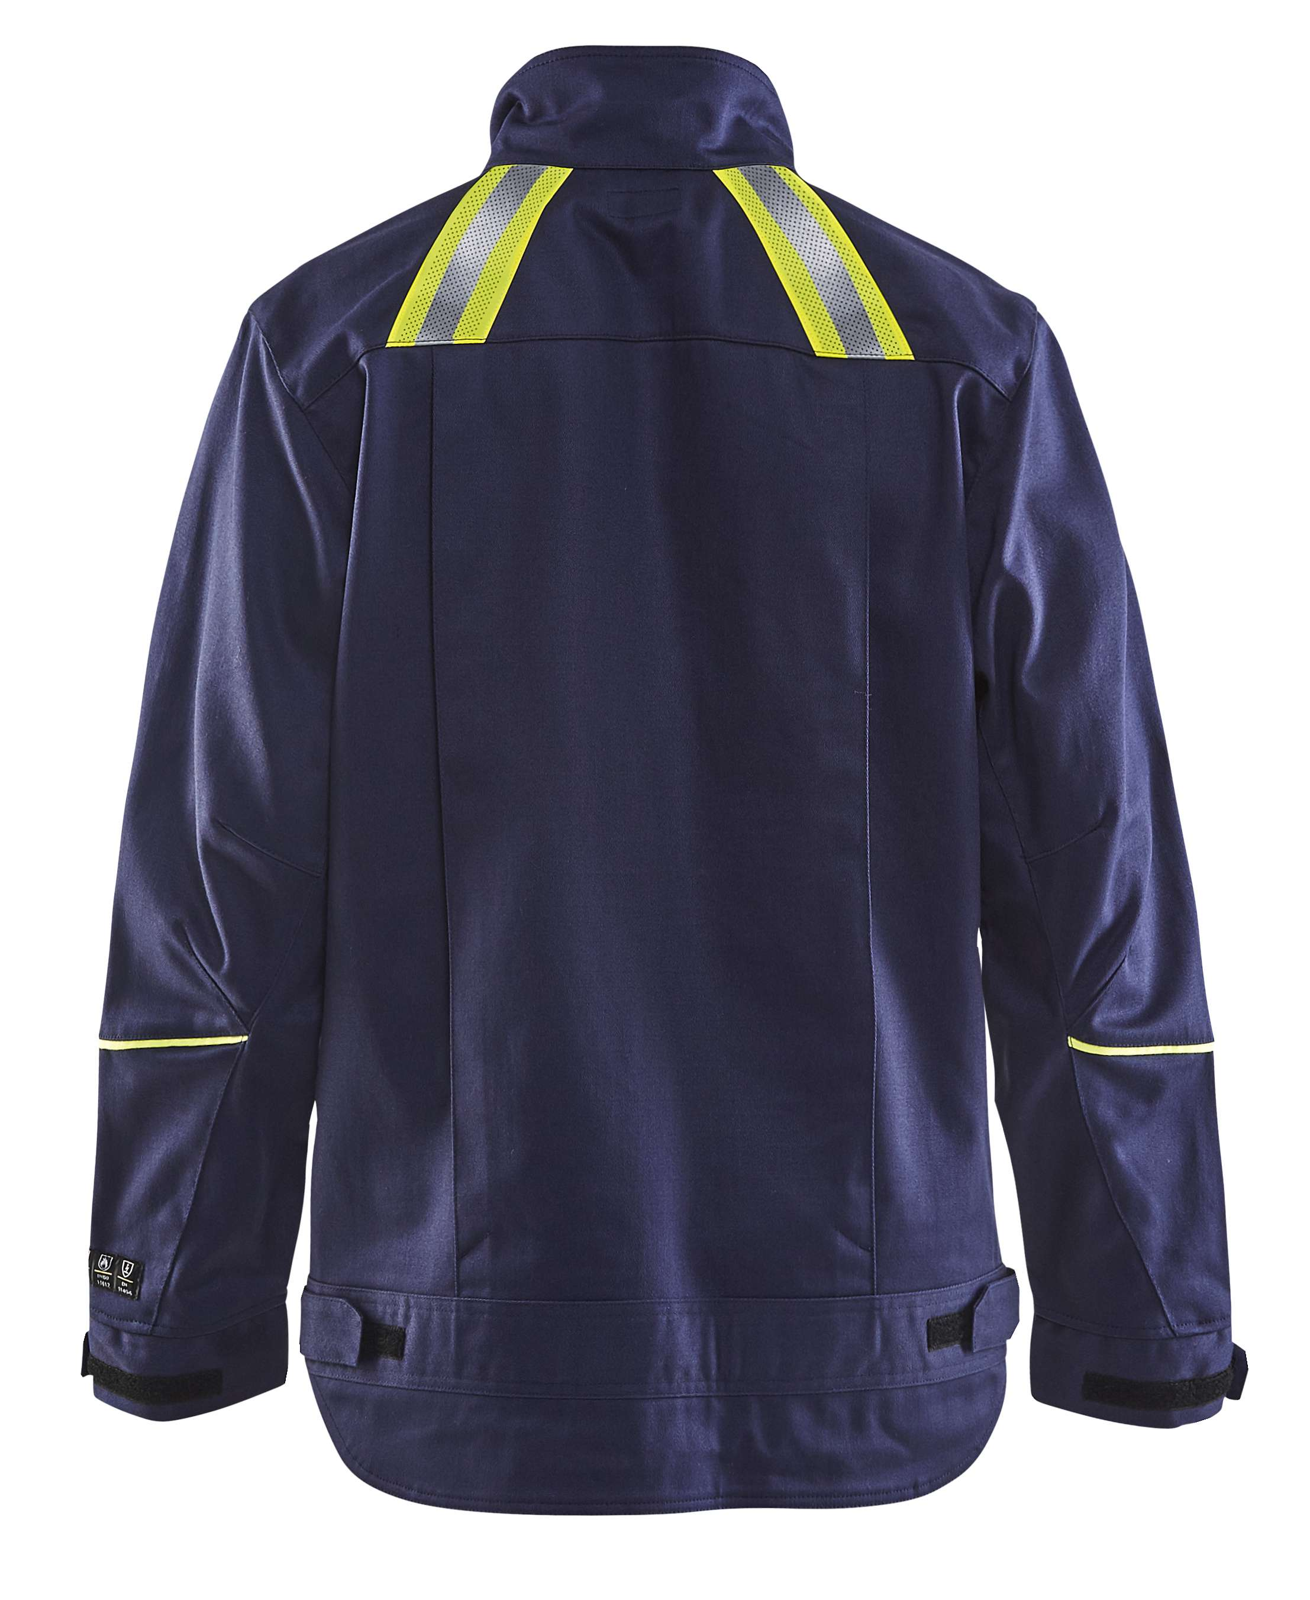 Blaklader Lasjacks 48011501 Vlamvertragend marineblauw-geel(8933)